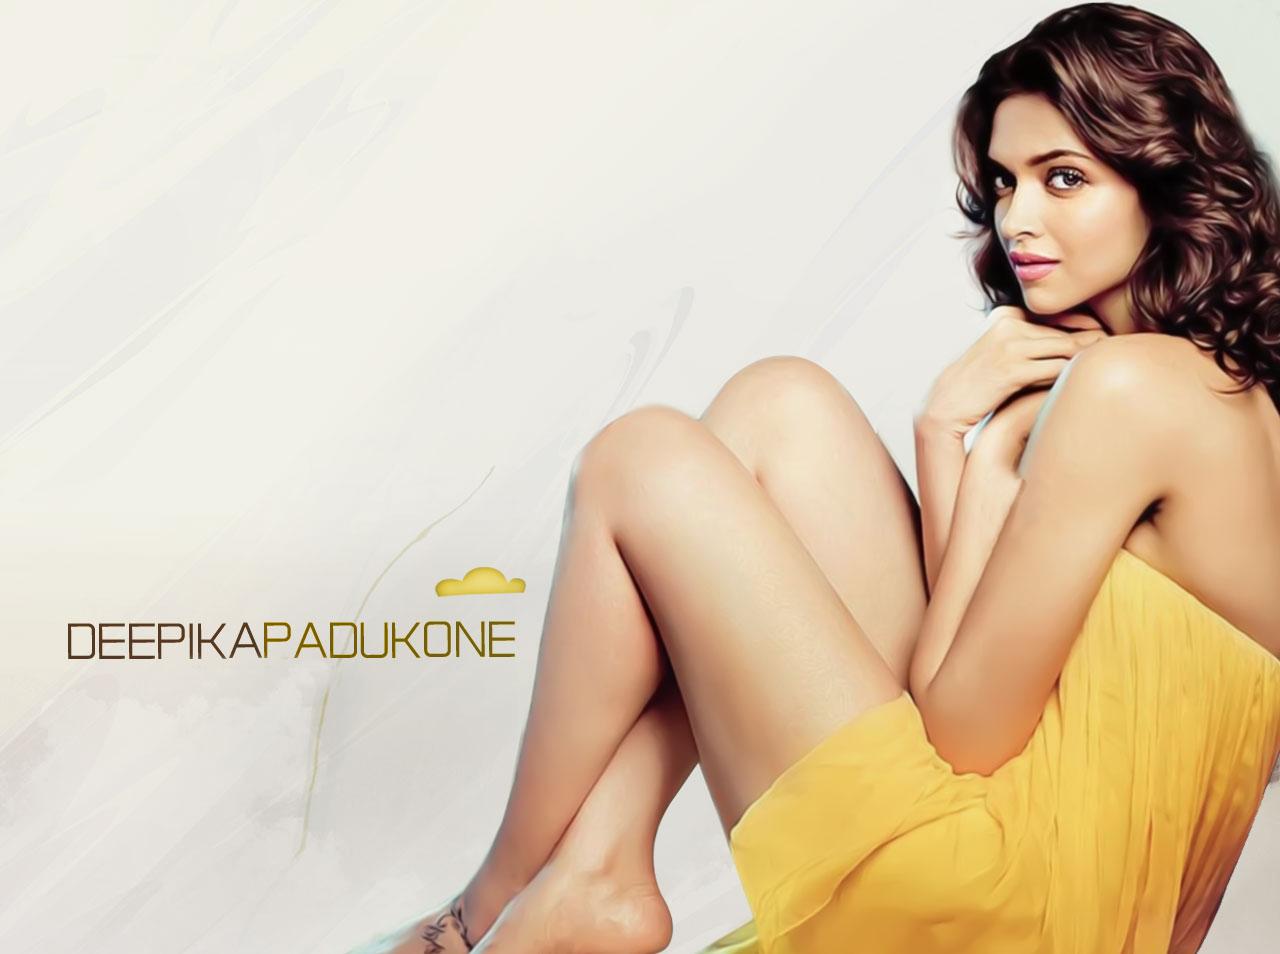 Deepika Sexy Video Download